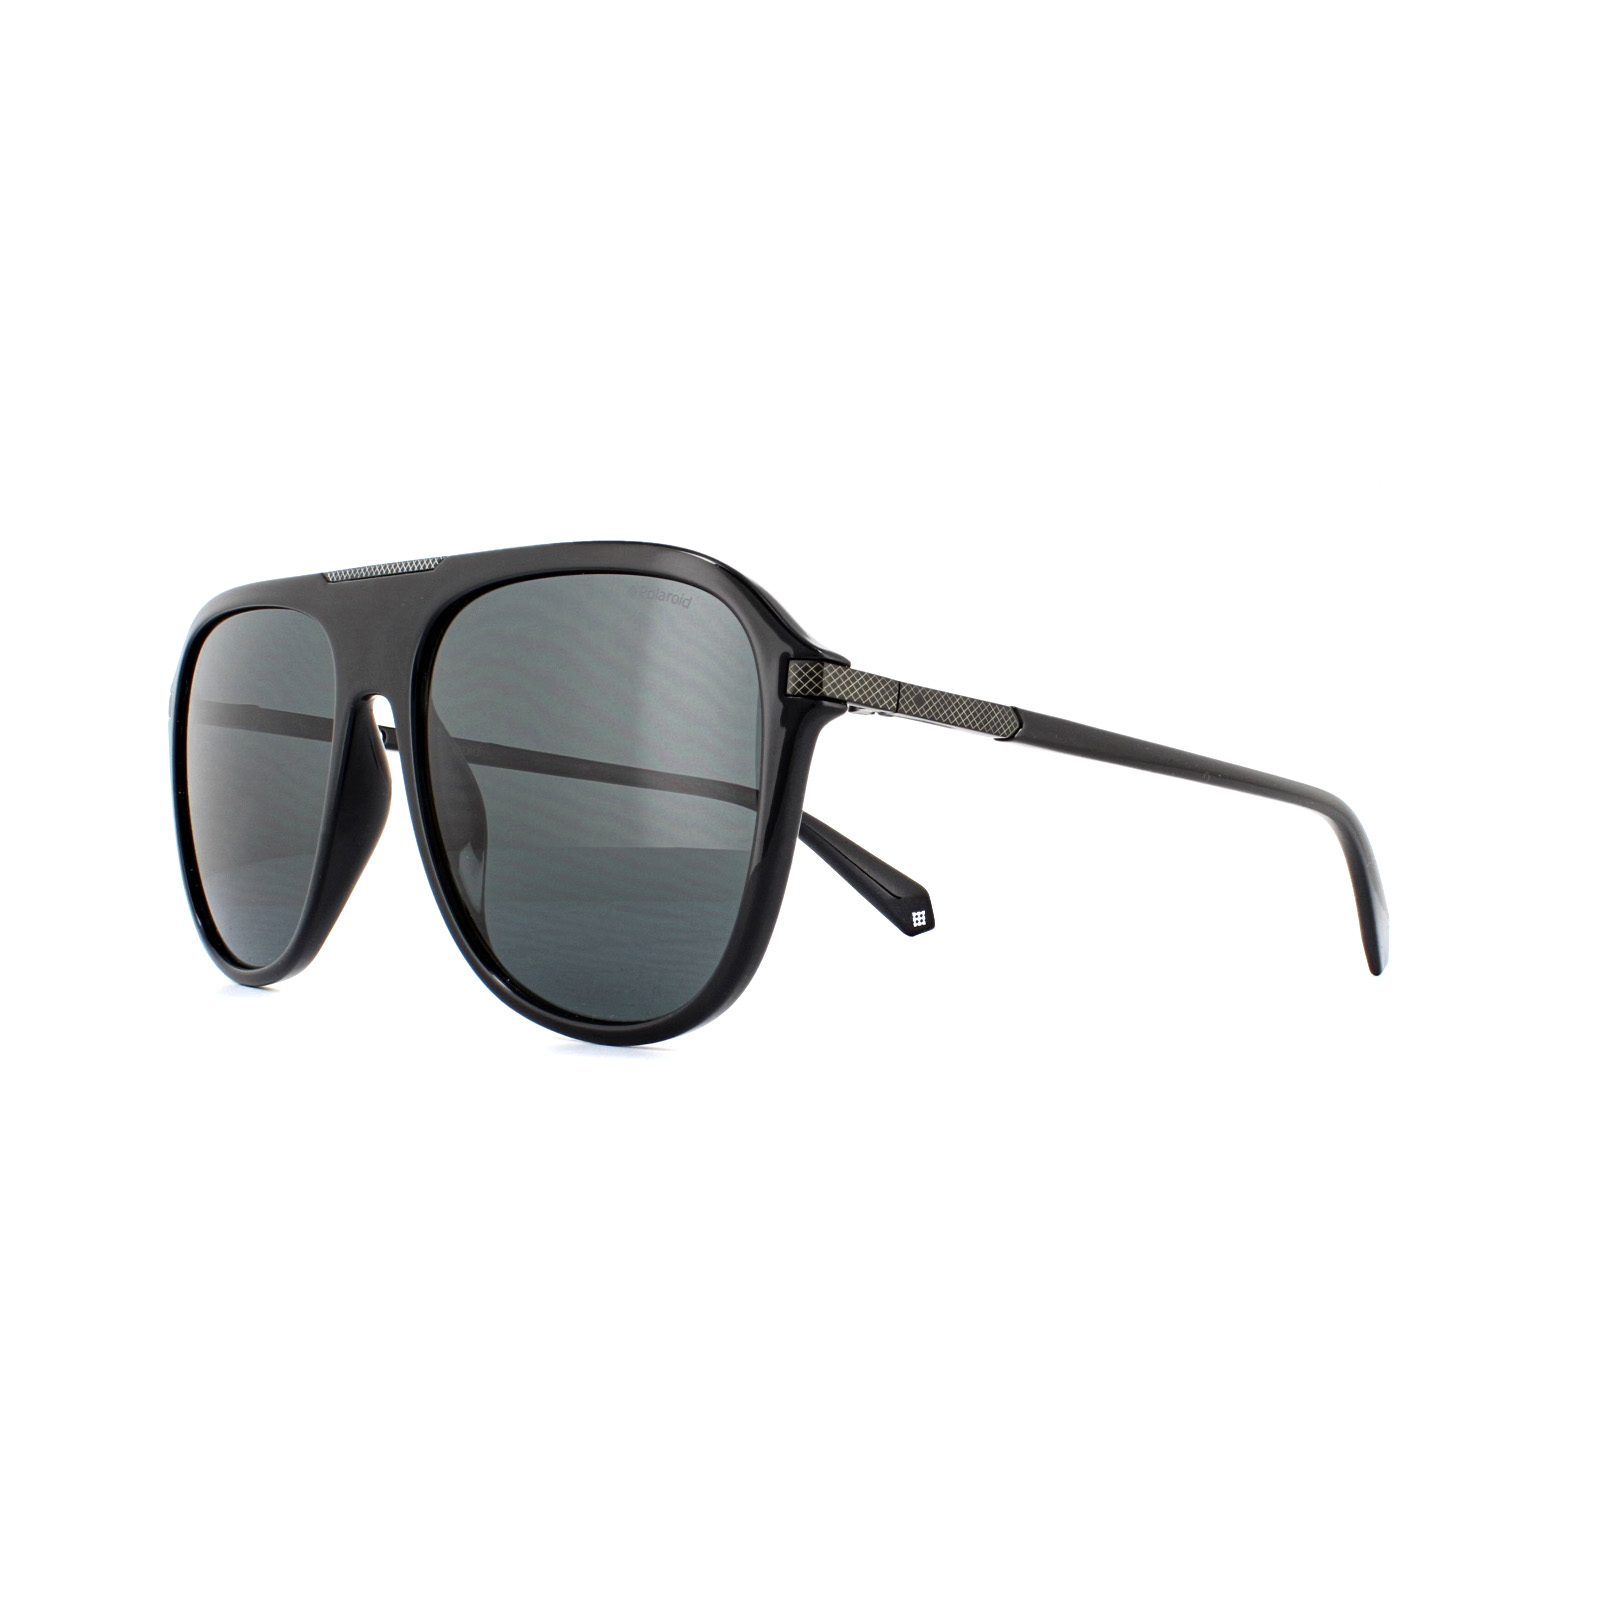 319910164aa X Sunglasses  Cheap Polaroid PLD 2070 S X Sunglasses - Discounted ...